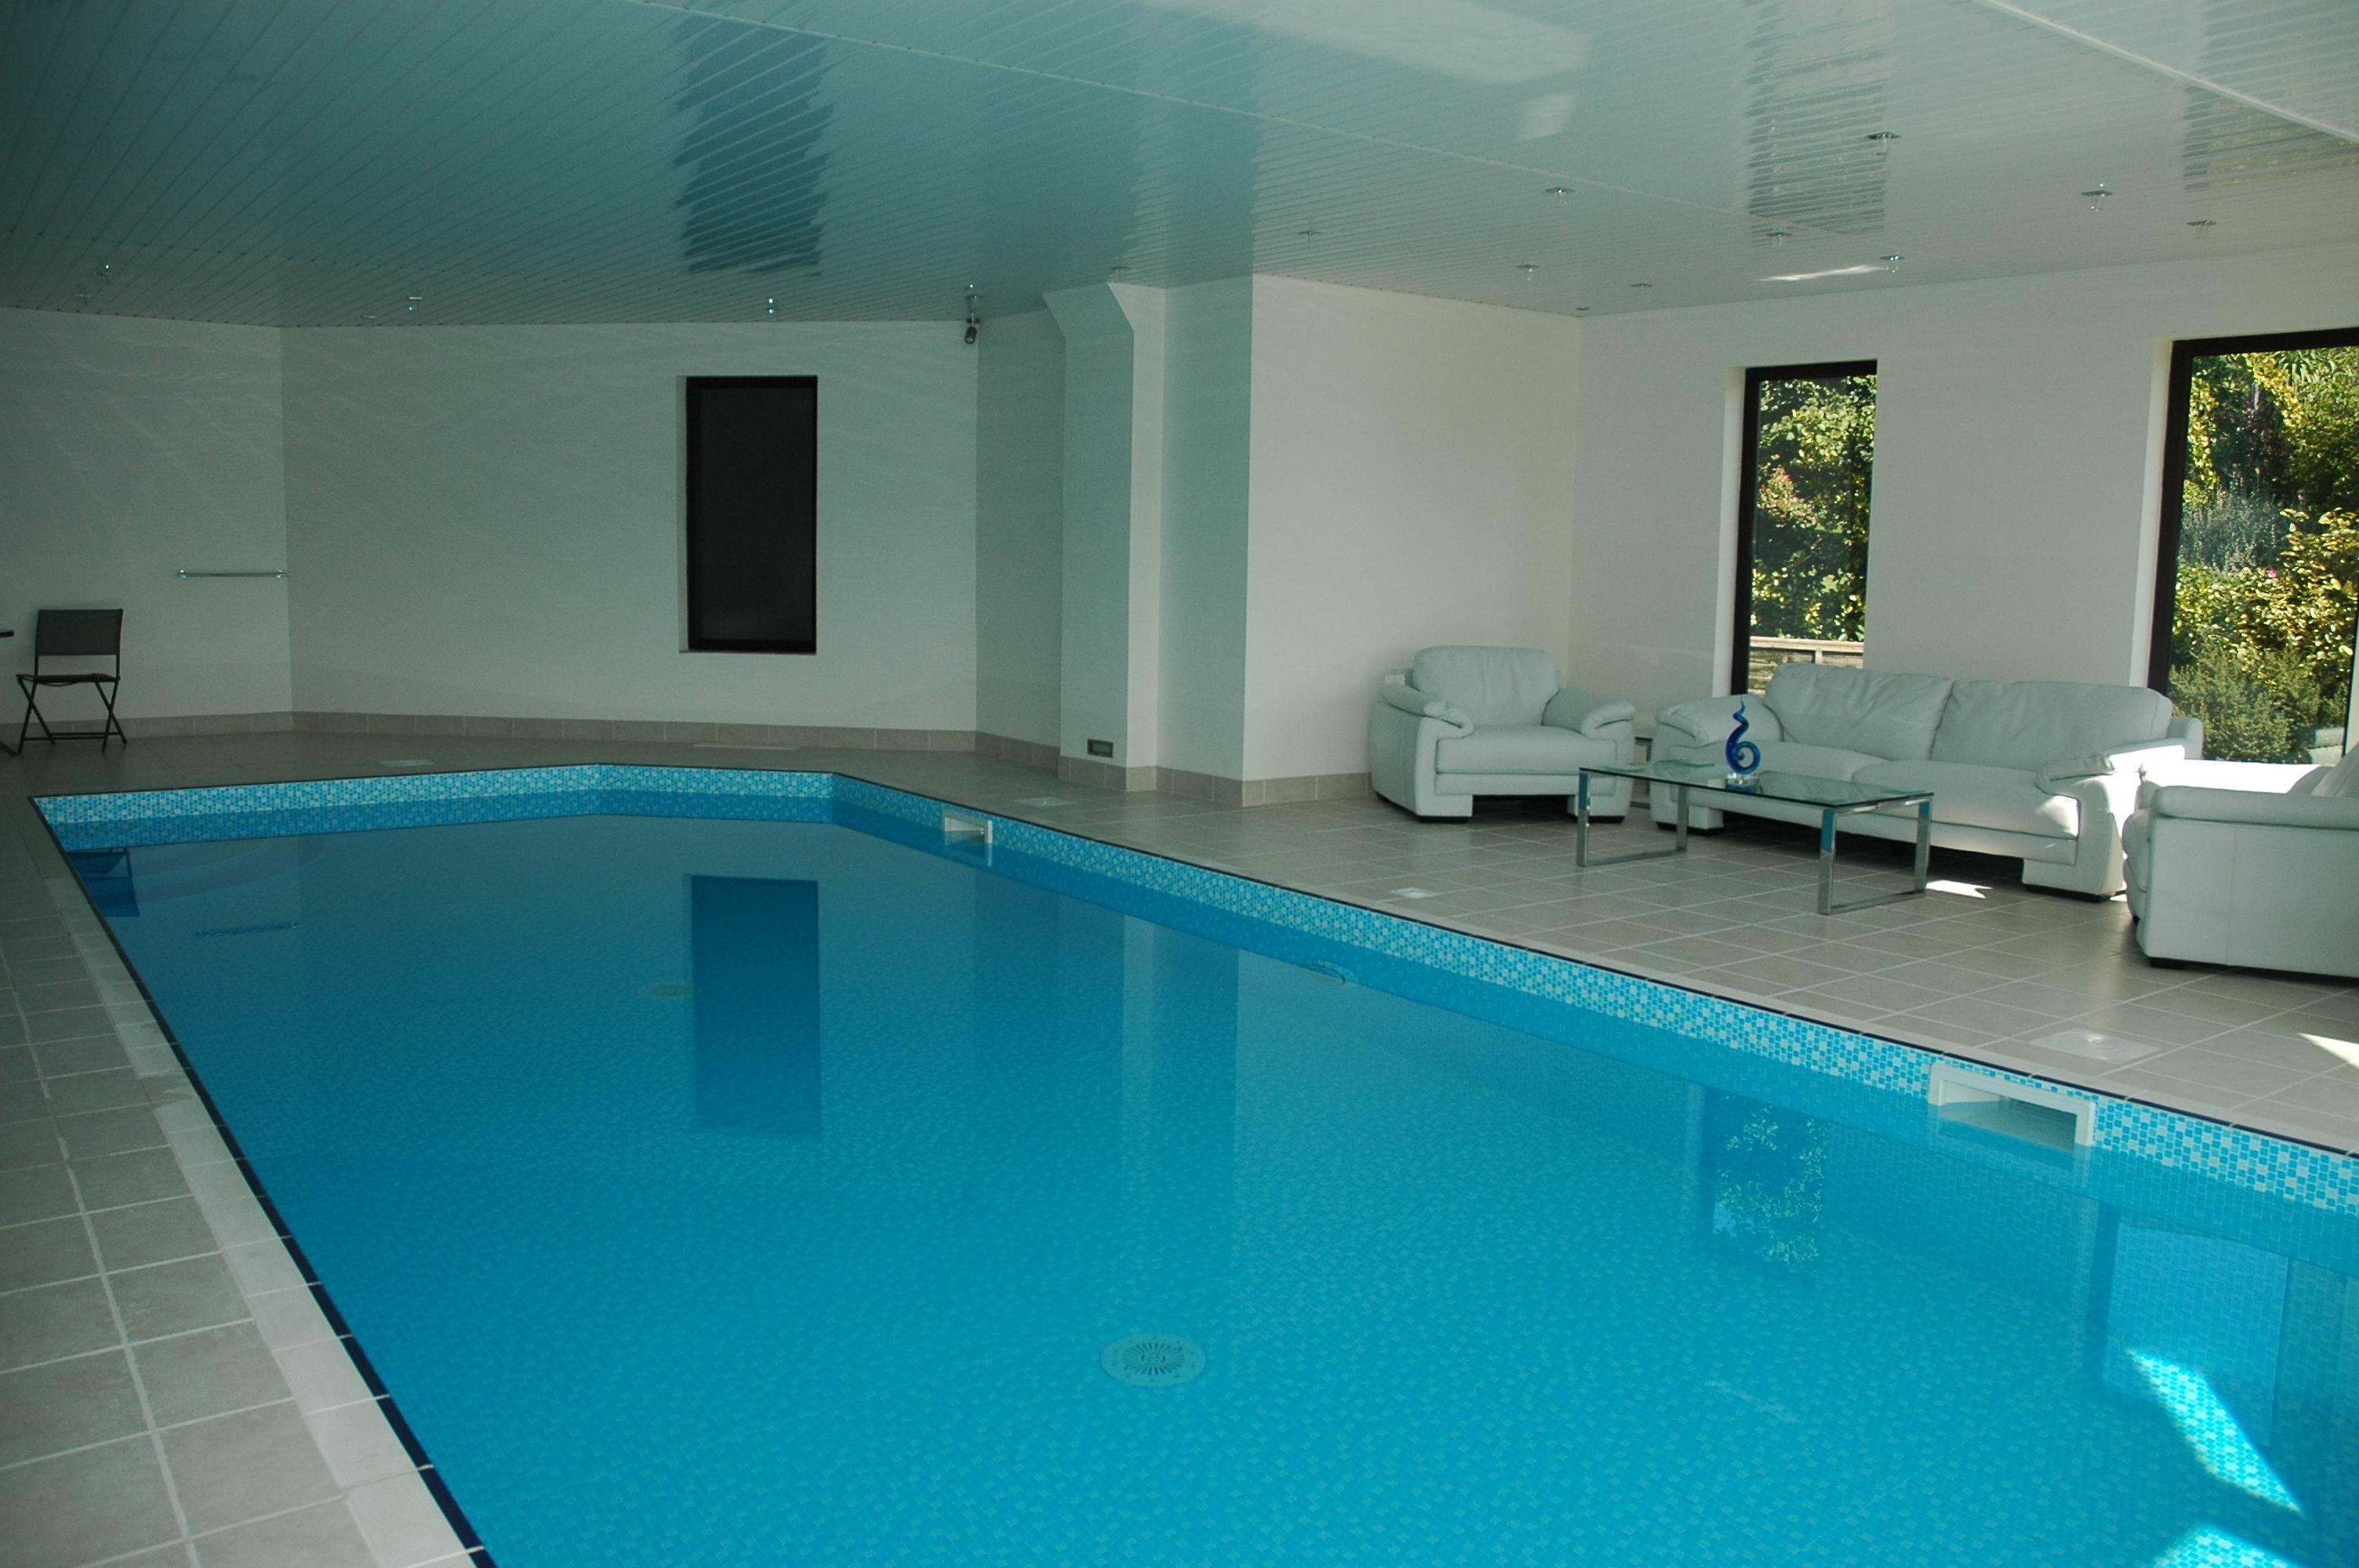 Pool and Furniture